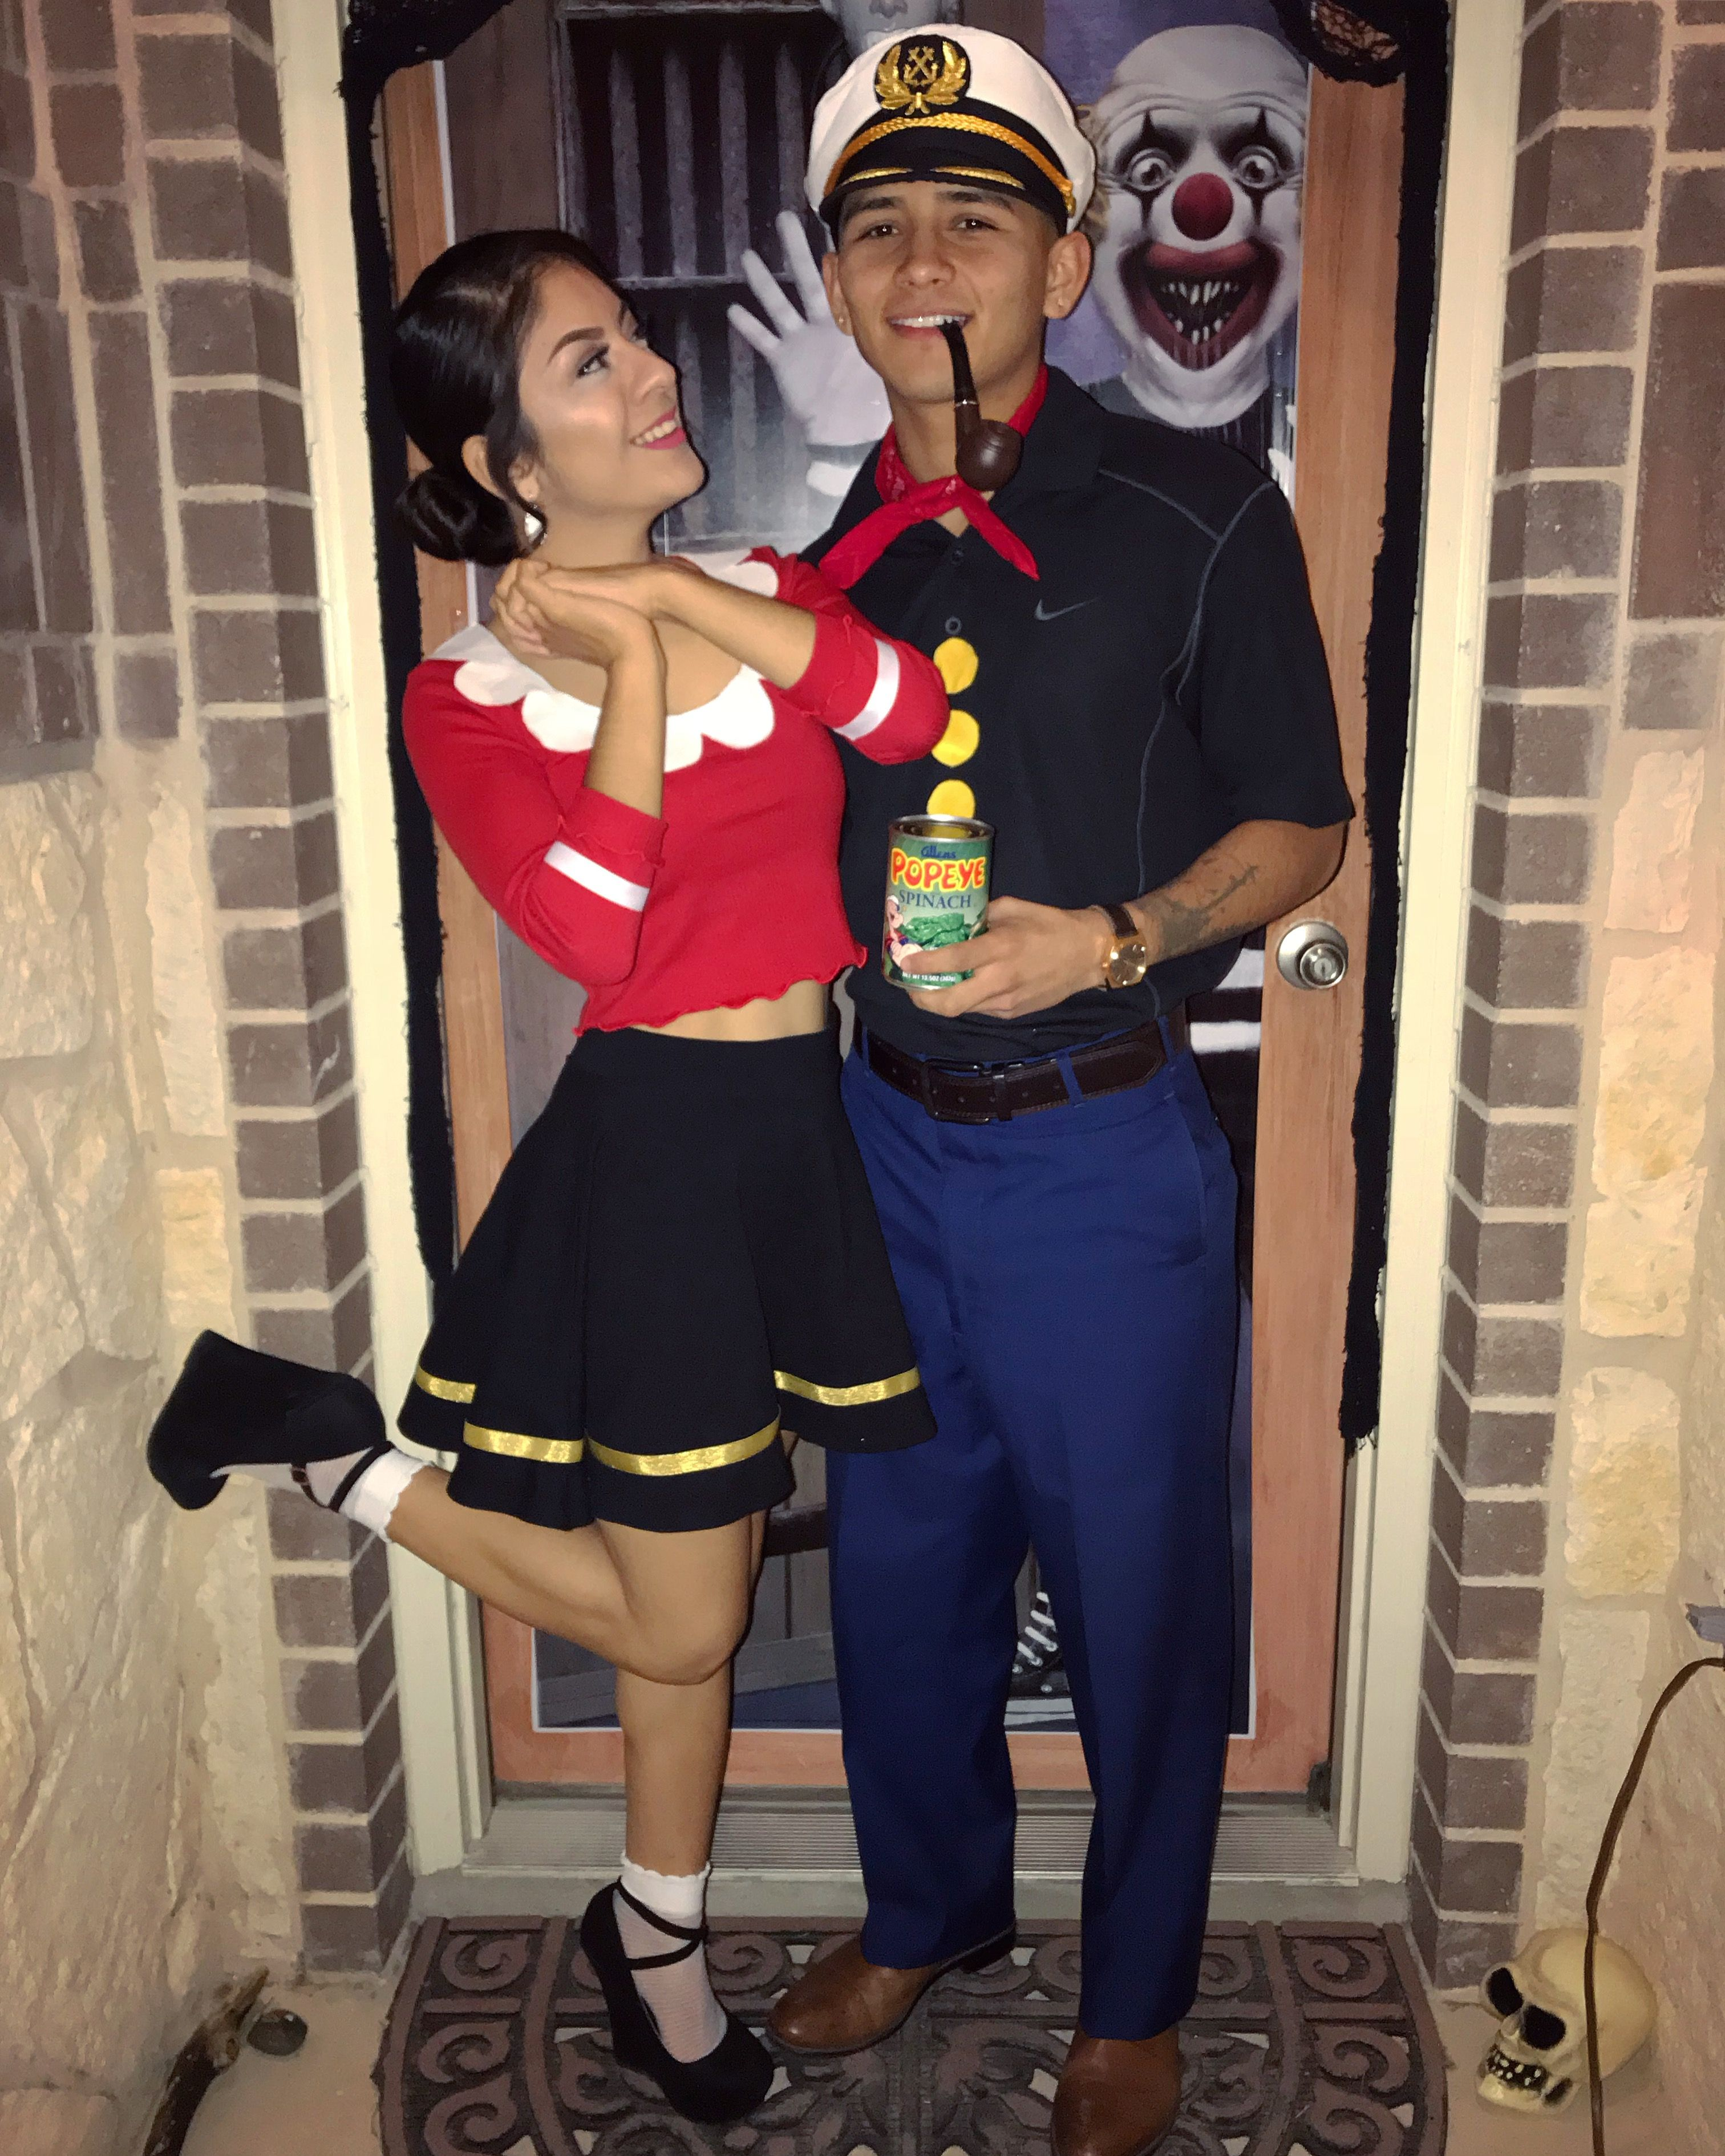 Adult Ms Popeye plus size Costume - Popeye Costumes  |Popeye Zombie Costumes